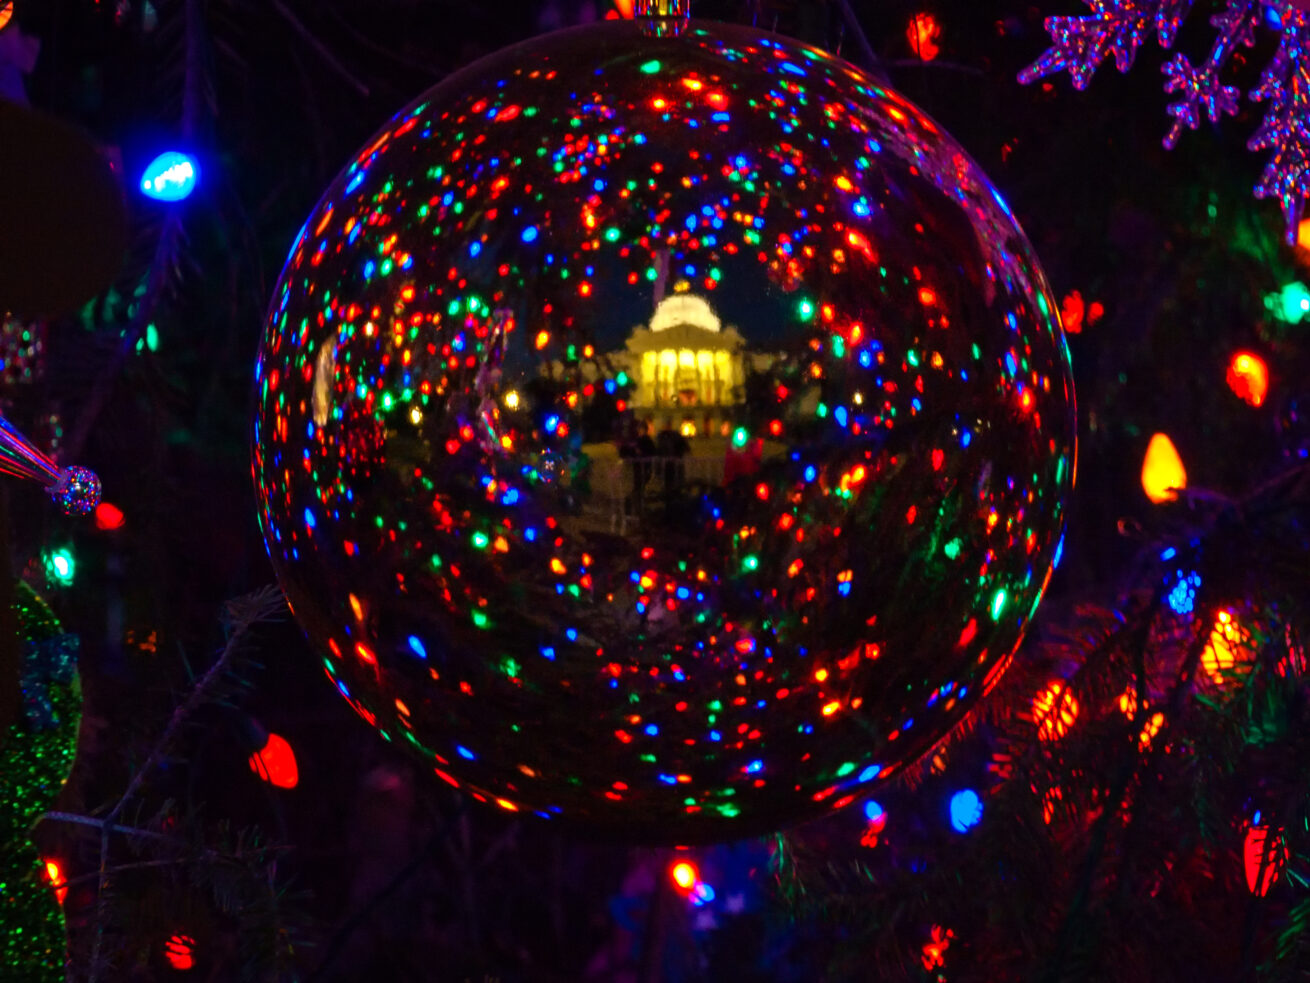 Capitol Reflection at Christmas